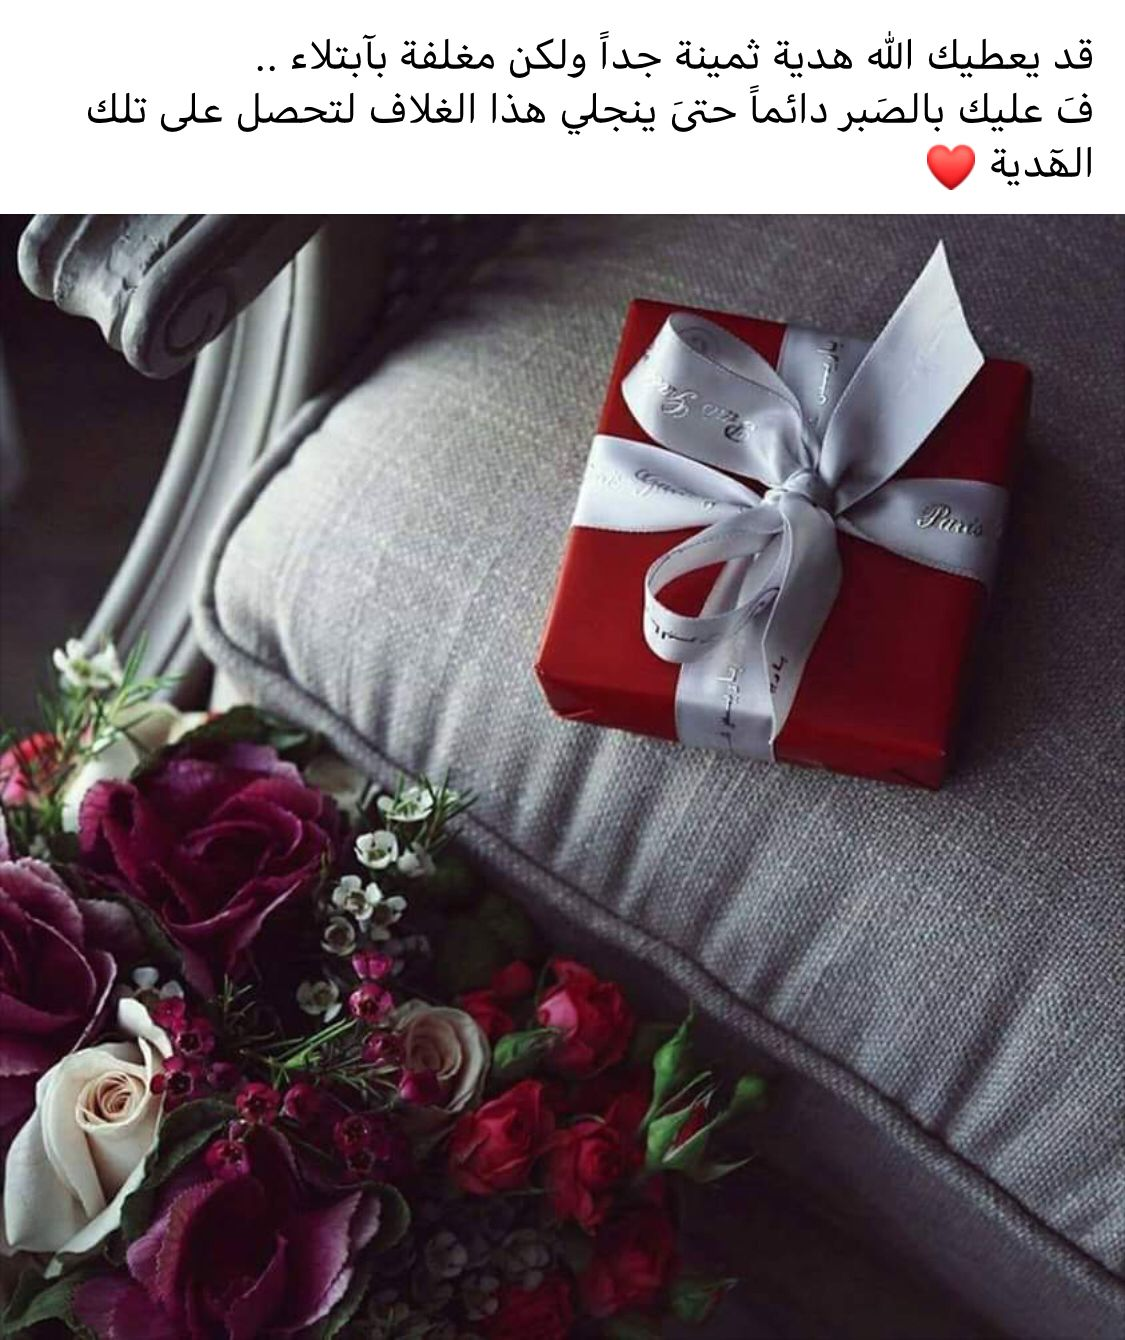 Pin By Hanan Aladwani On مواعظ خواطر إسلامية Islamic Phrases Old Fashioned Christmas Wise Quotes